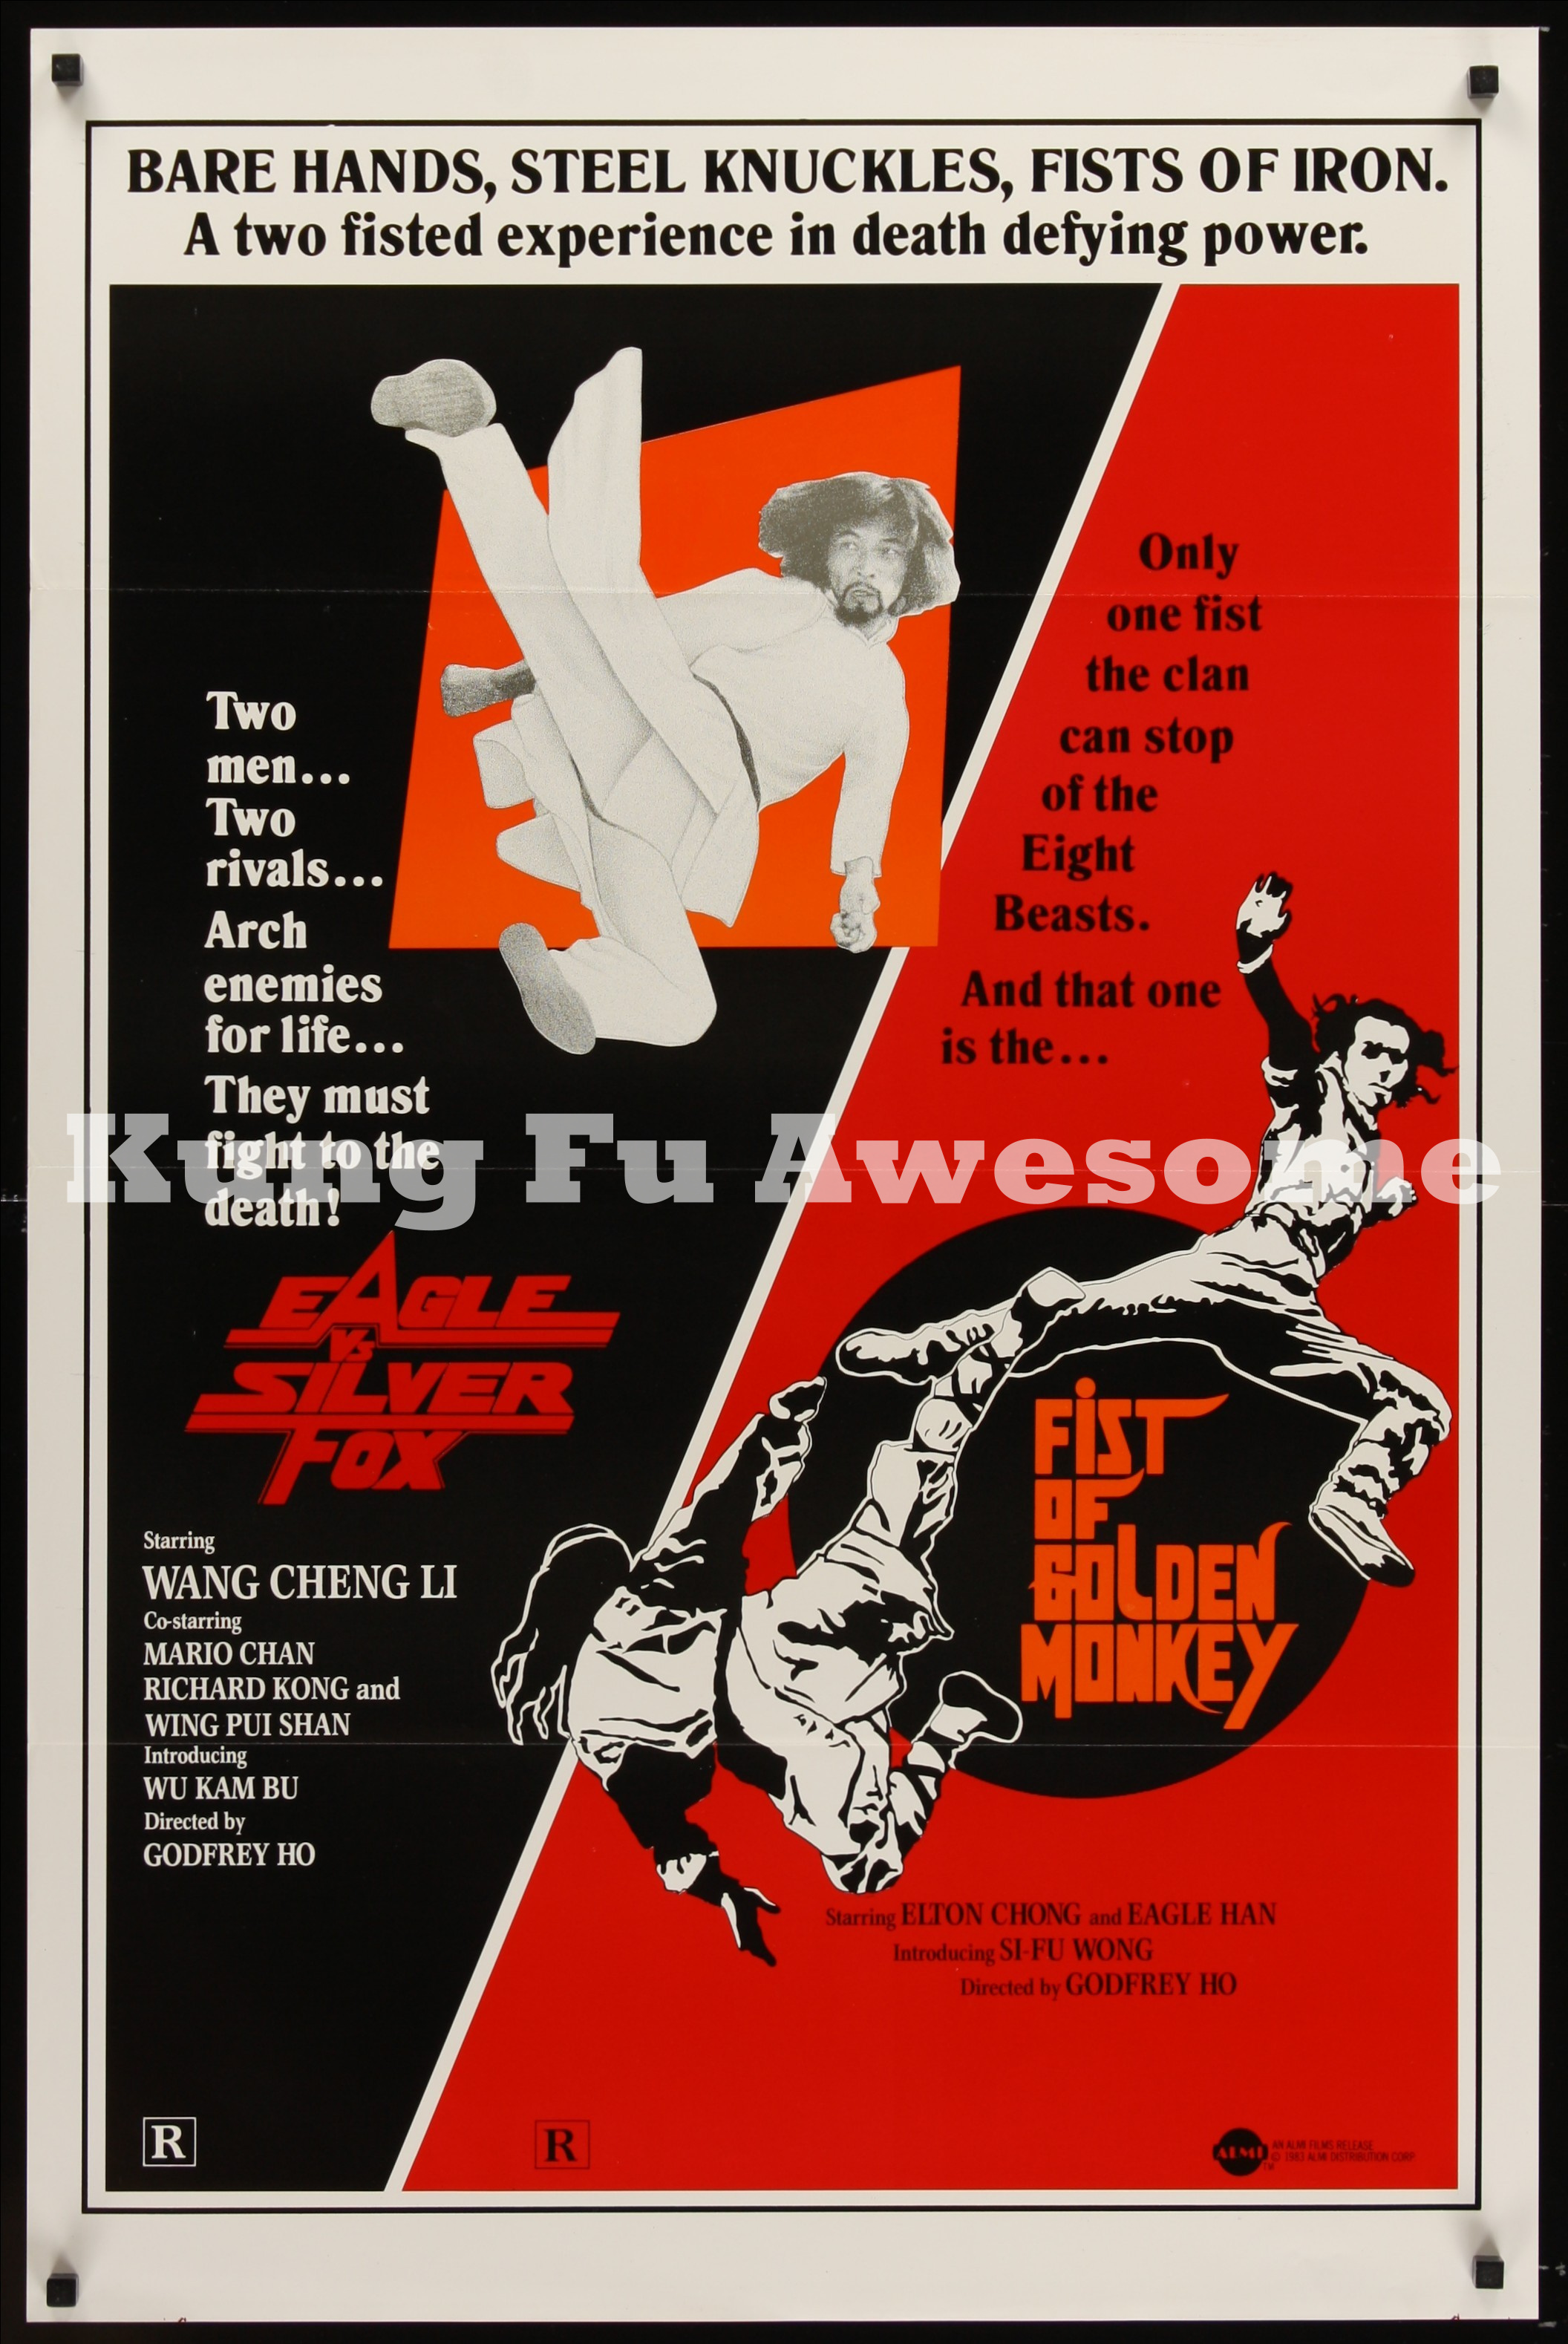 eagle_vs_silver_fox_and_fist_of_golden_monkey_NZ03465_L.jpg